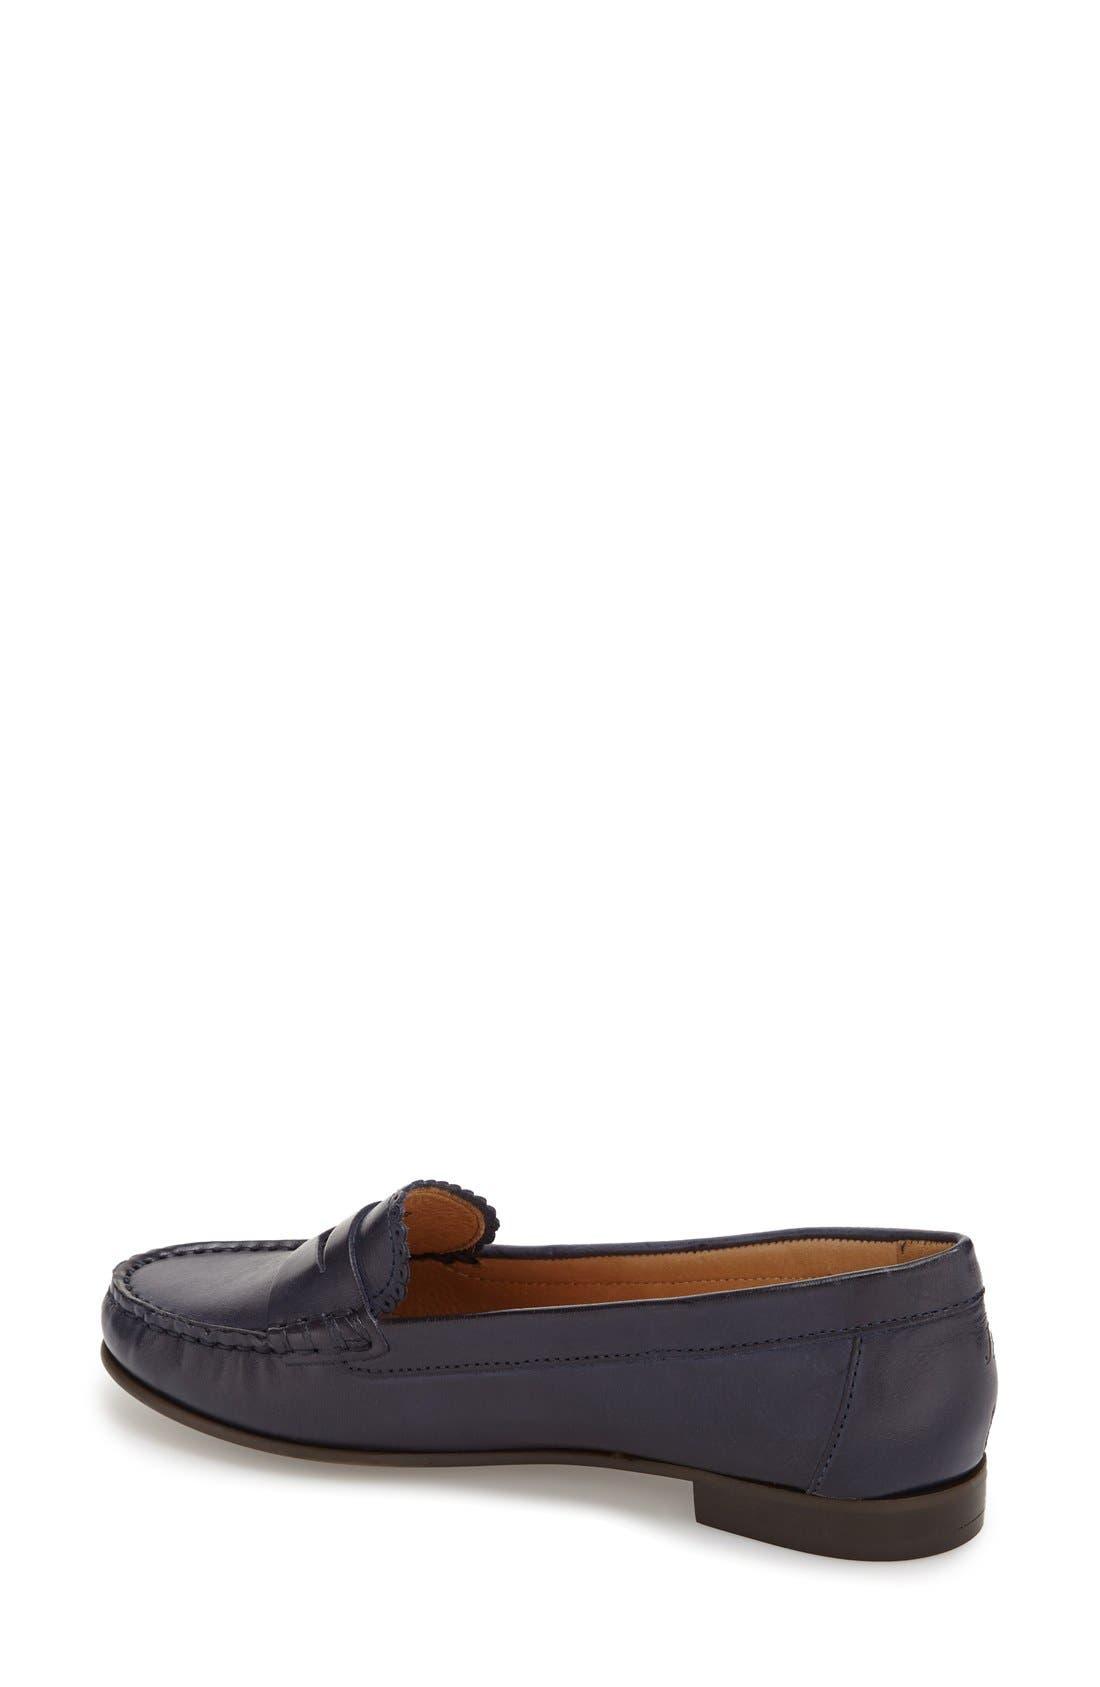 'Quinn' Leather Loafer,                             Alternate thumbnail 23, color,